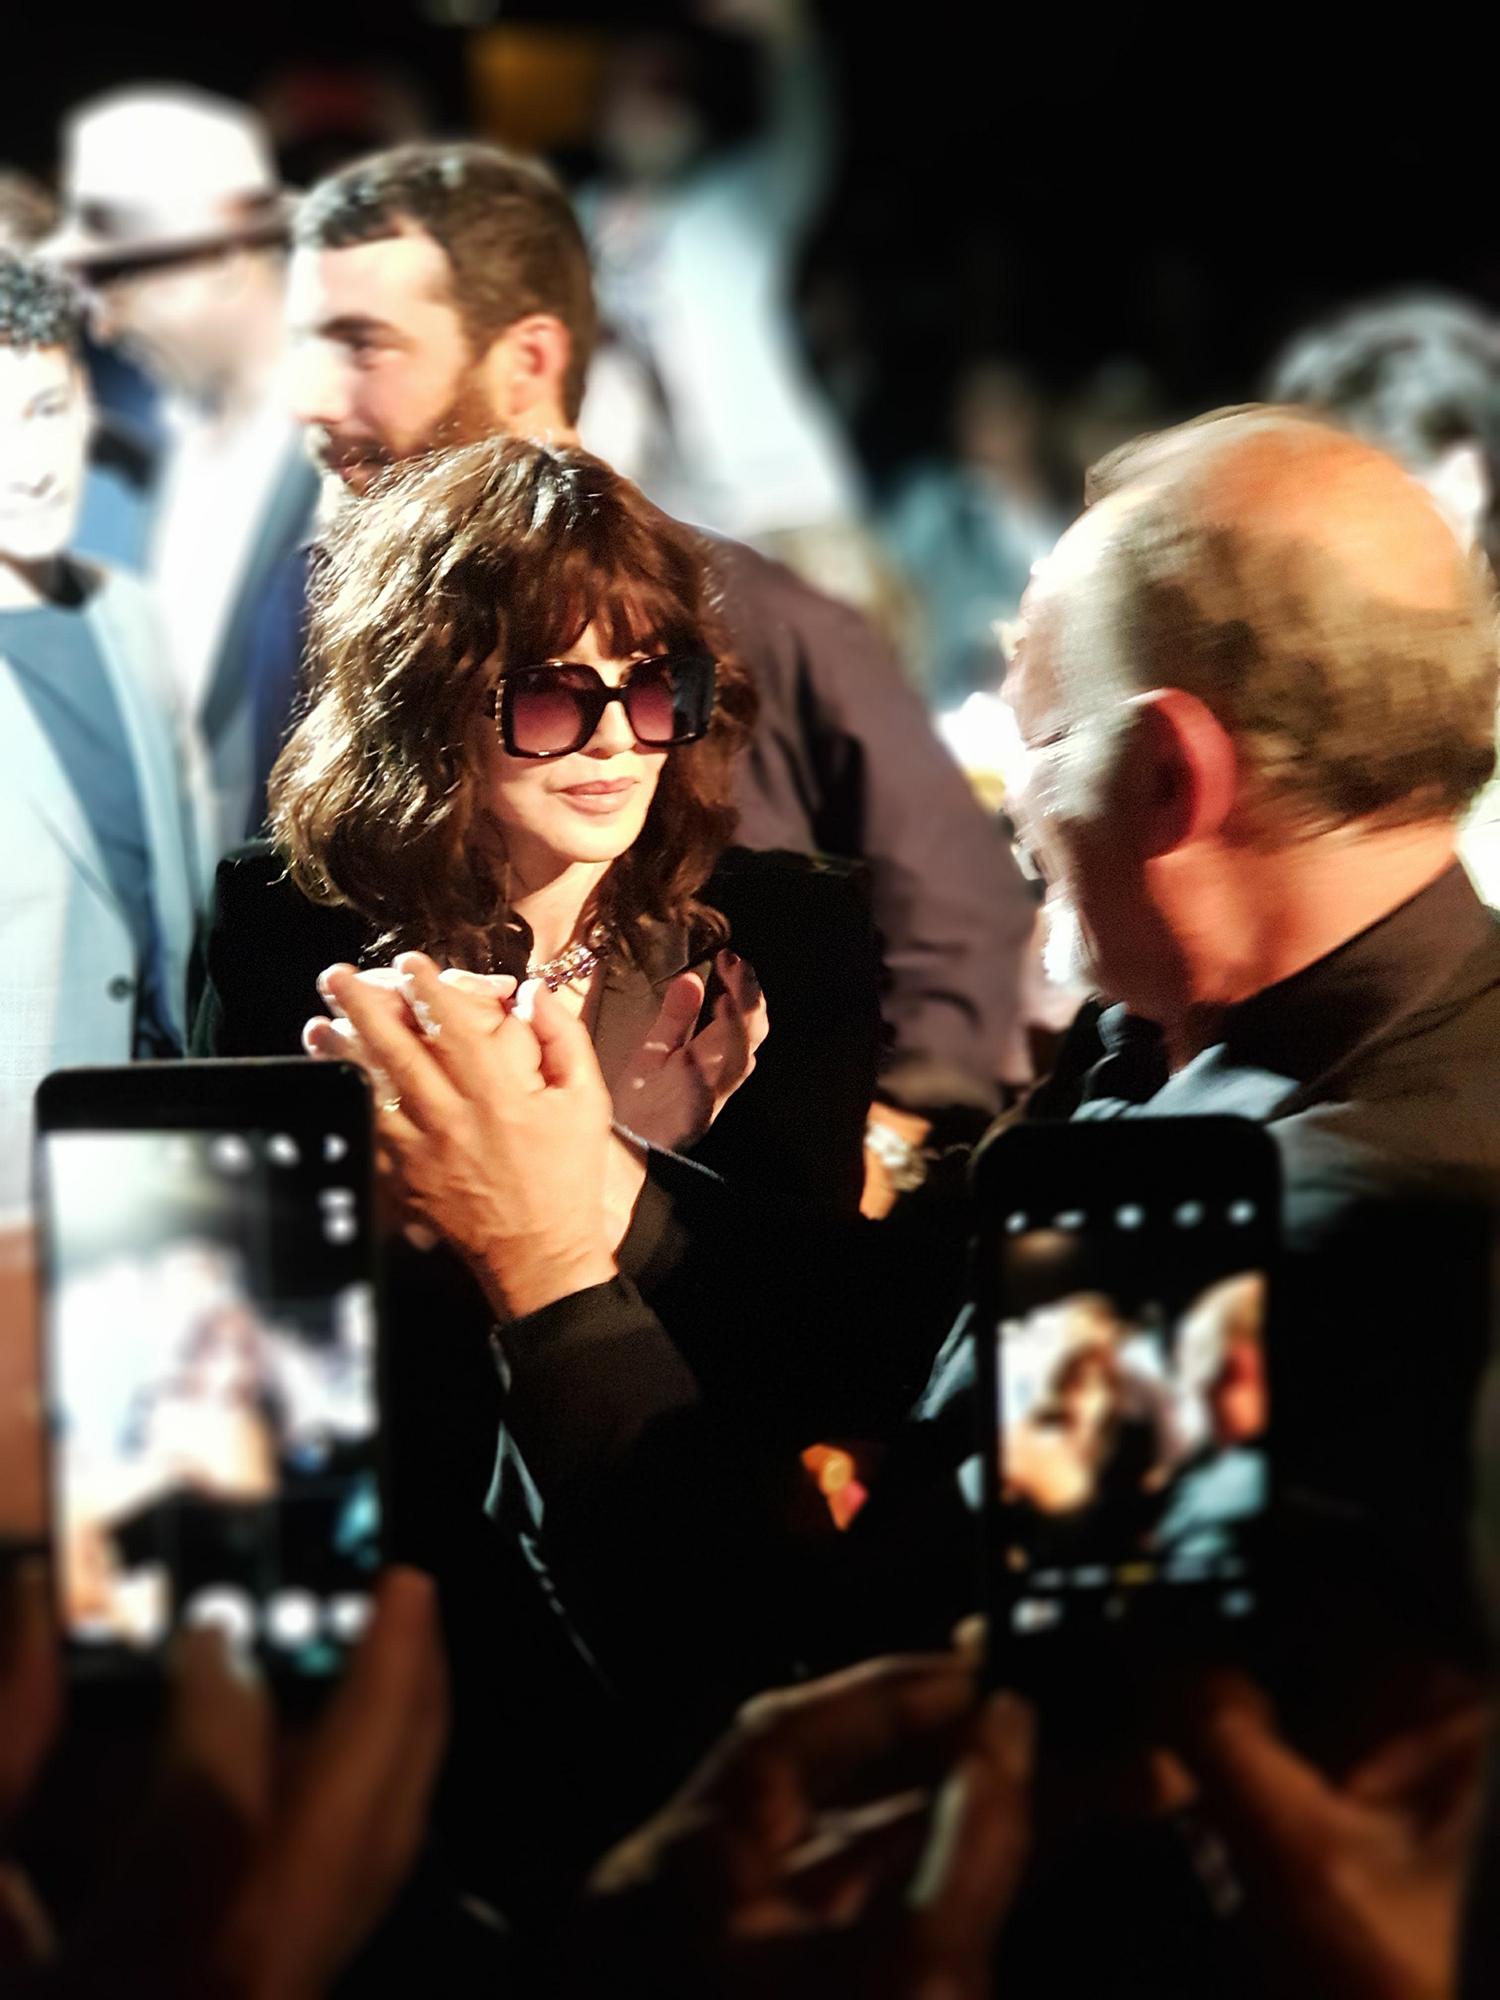 Quai10 - Festival Cannes 2018